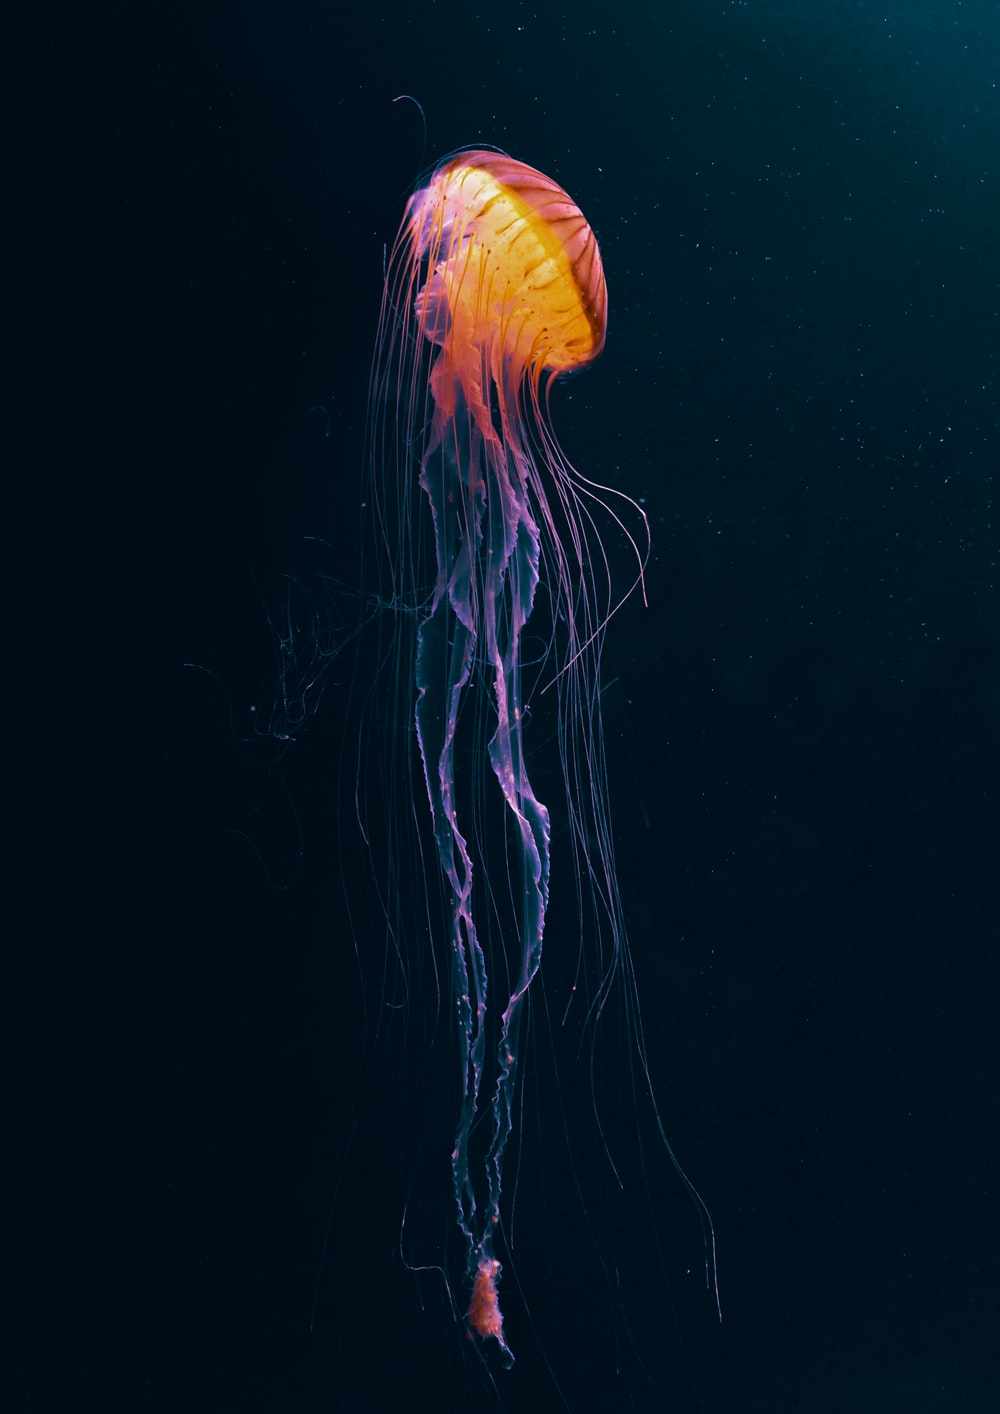 orange jellyfish in water during daytime